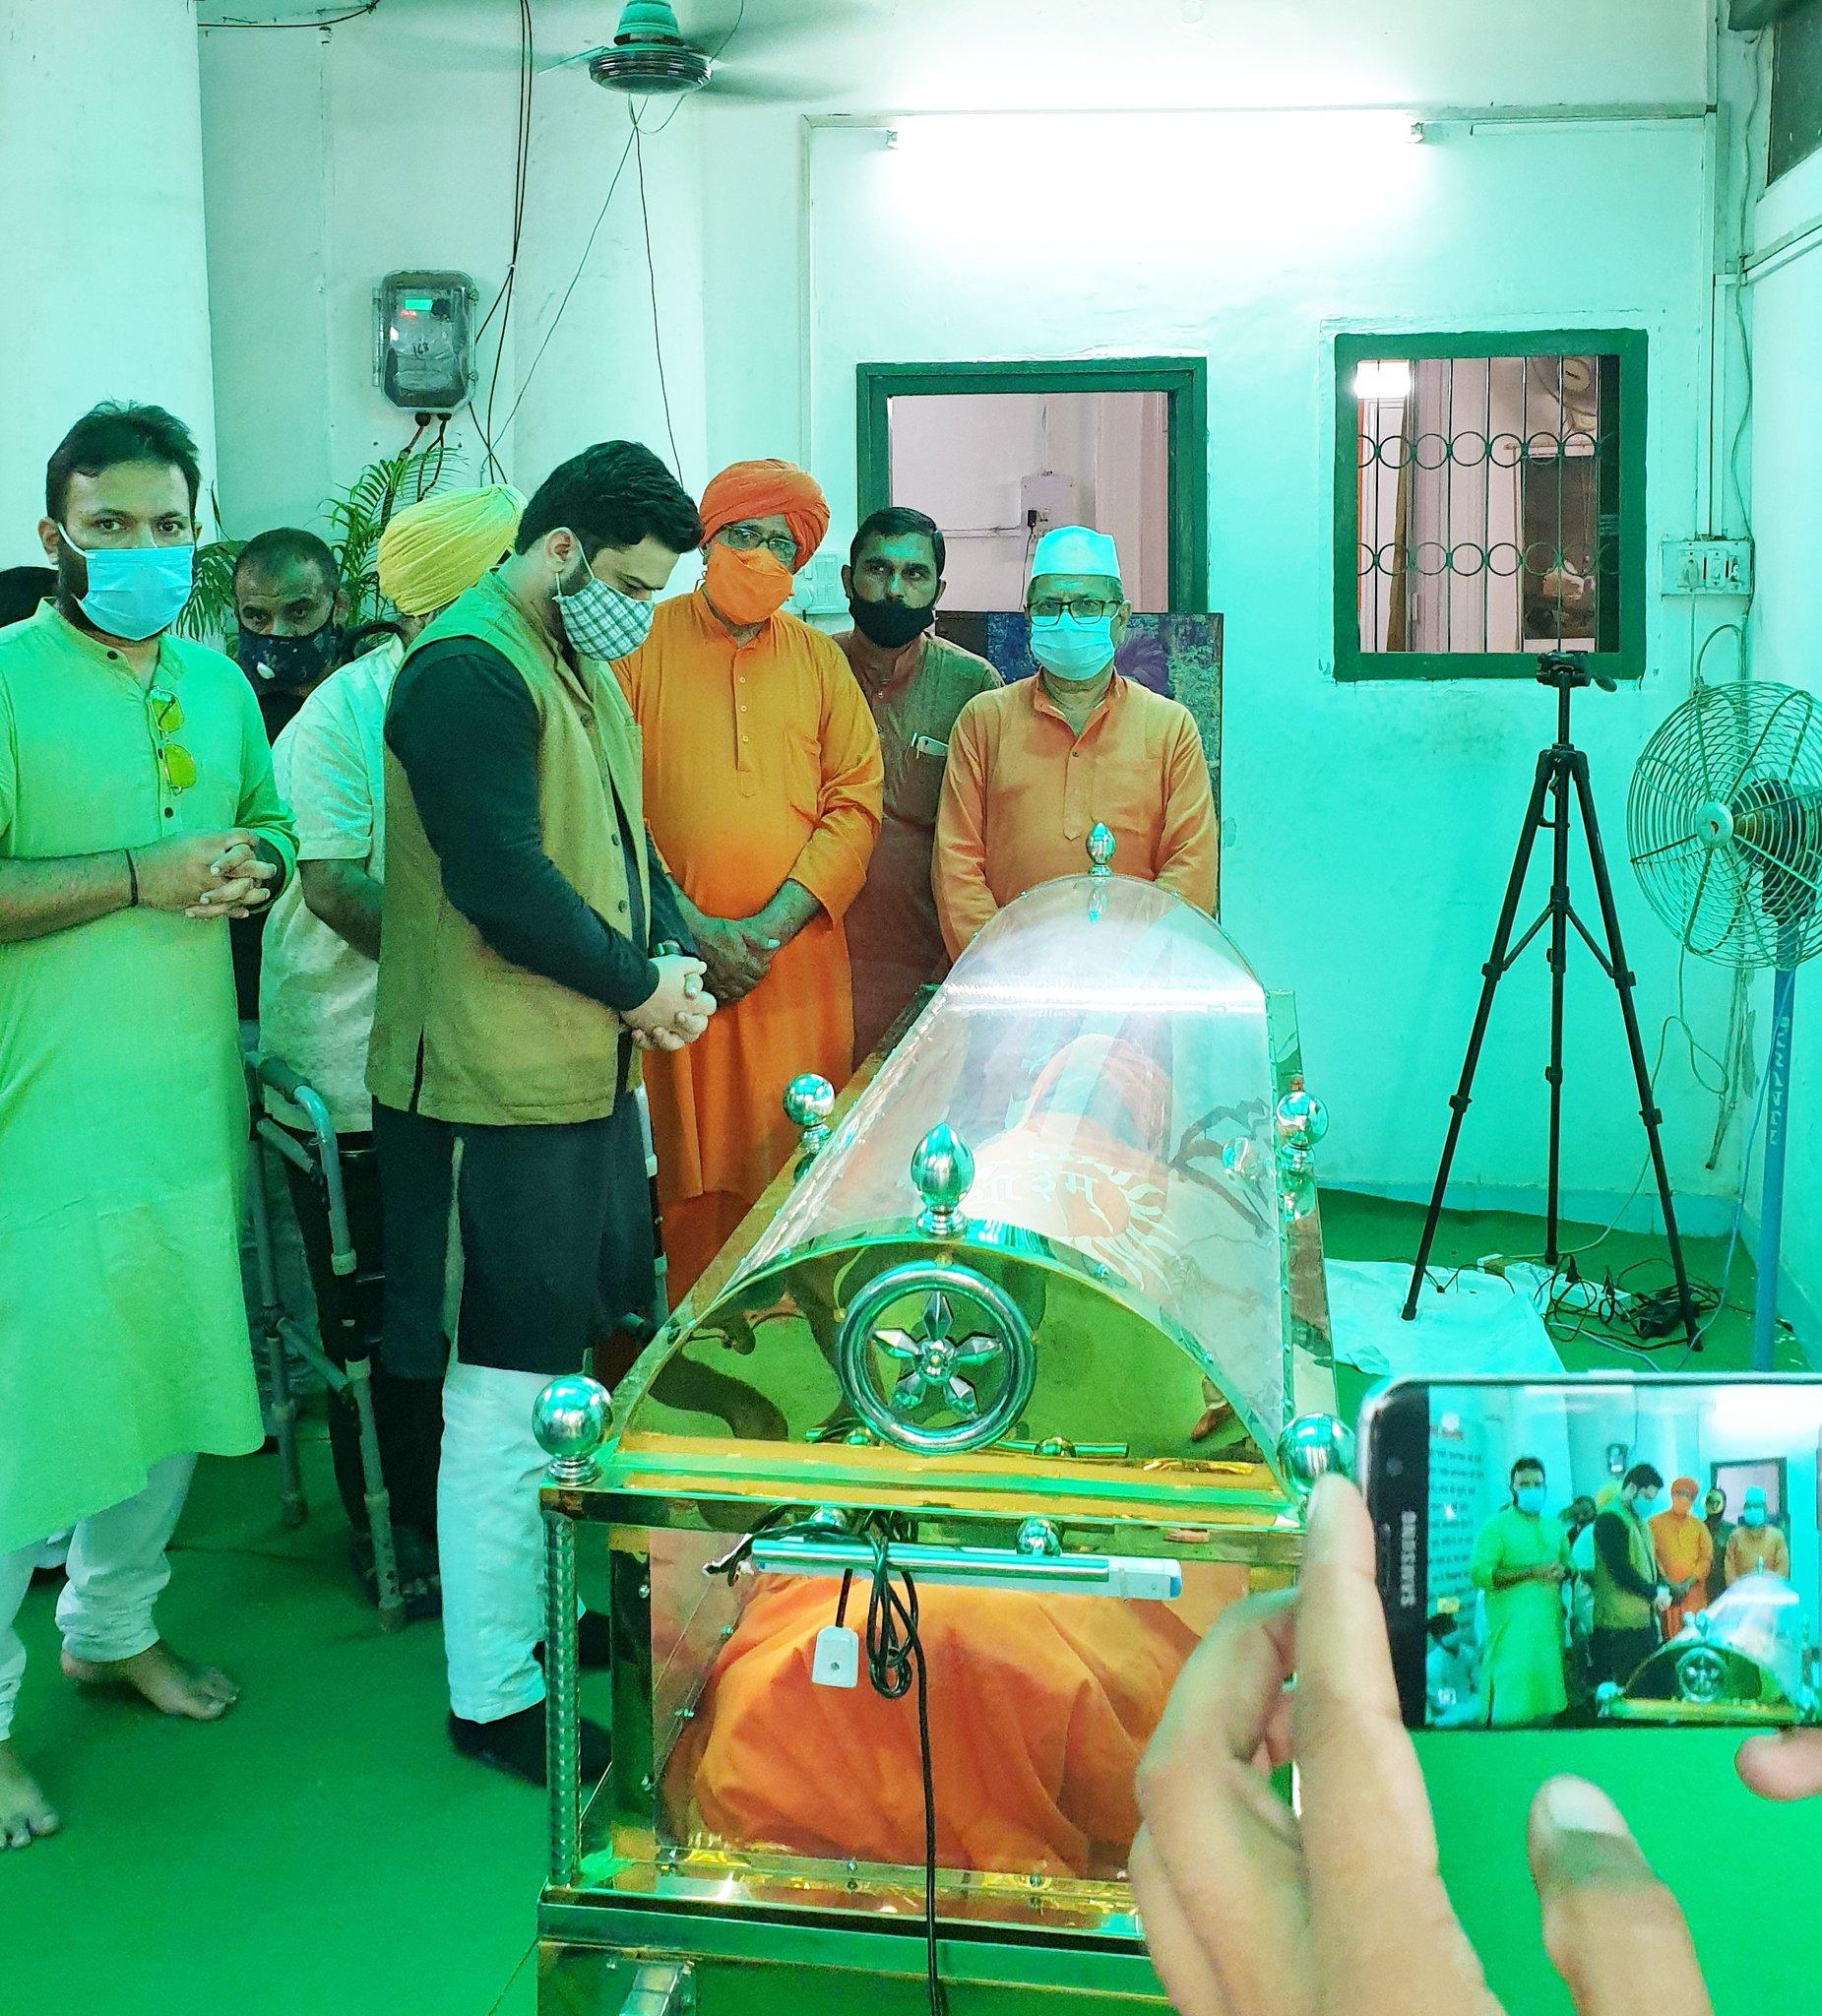 Dead or Death body pic Swami Agnivesh Biography, Swami Agnivesh Age, Swami Agnivesh education, Swami Agnivesh parents, Swami Agnivesh wiki, Swami Agnivesh date of birth Swami Agnivesh family, Swami Agnivesh wife, Swami Agnivesh girlfriends, Swami Agnivesh career, Swami Agnivesh son, Swami Agnivesh daughter, Swami Agnivesh caste, Swami Agnivesh muslim